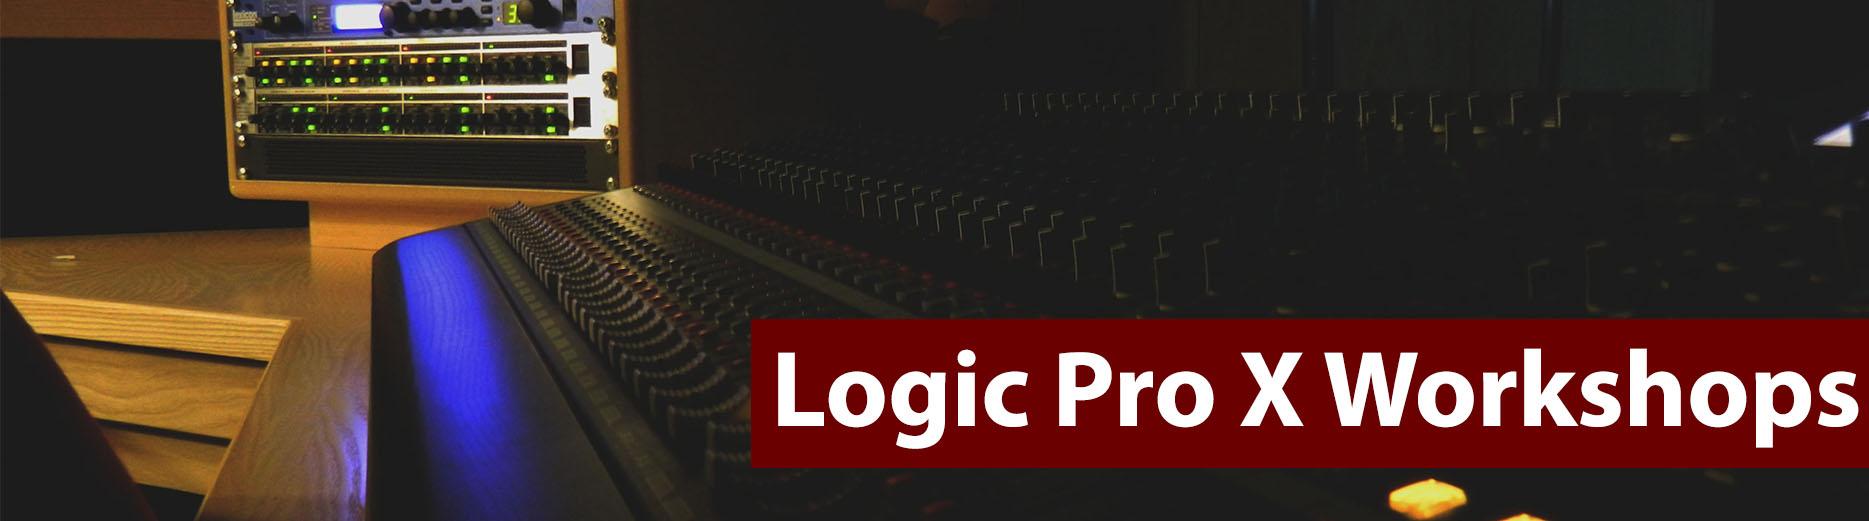 logic pro x workshops small